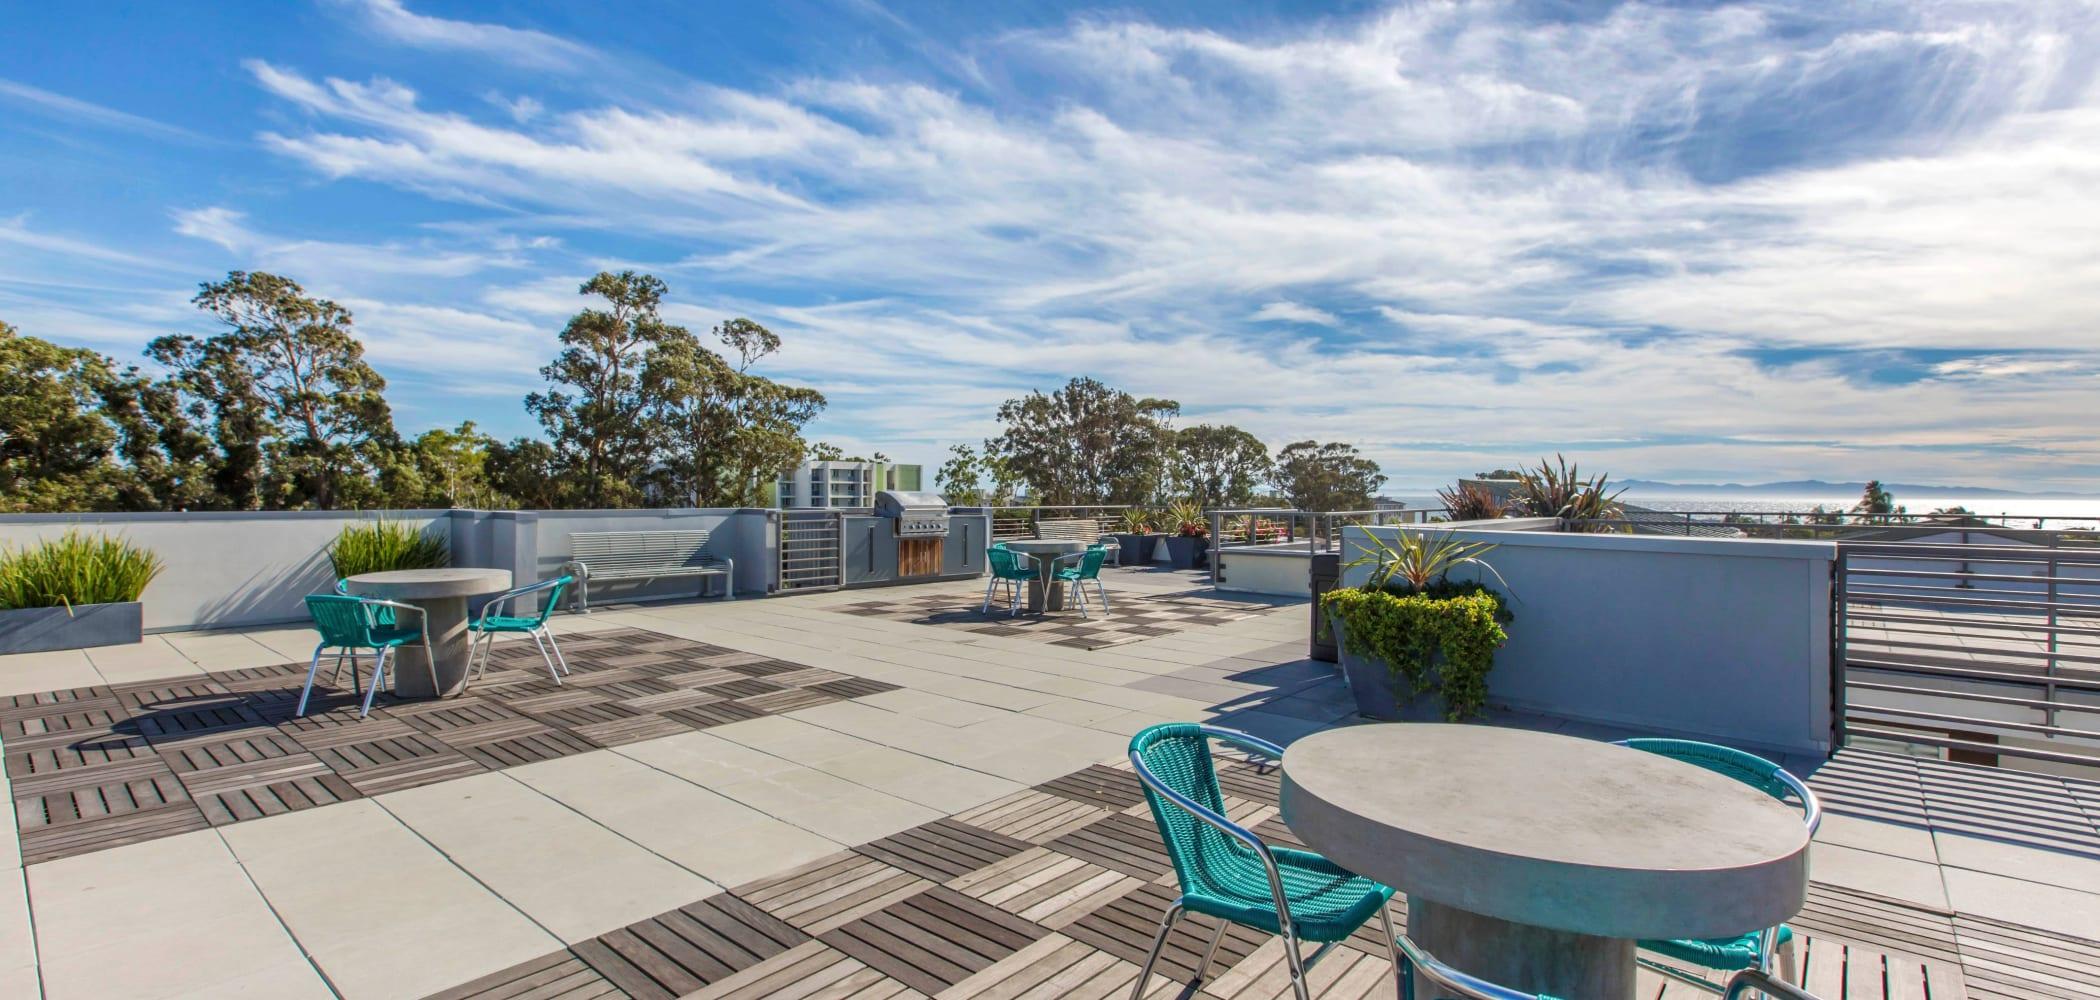 Rooftop patio area at ICON in Isla Vista, California